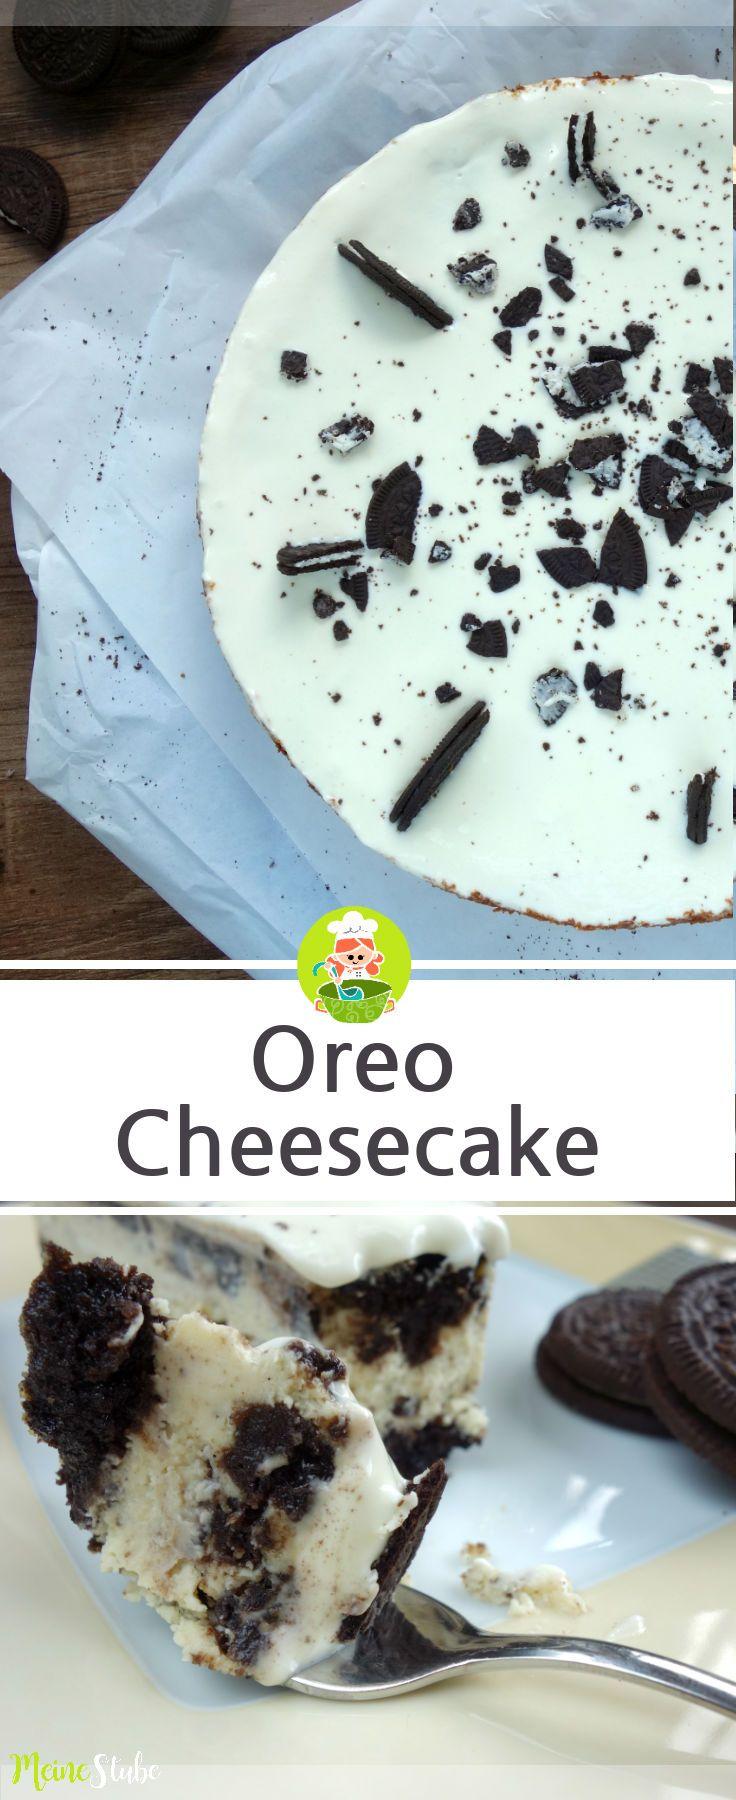 Rezept für einen Oreo Cheesecake, ein Kuchen aus Oreo Keksen. #oreo #käsekuche…